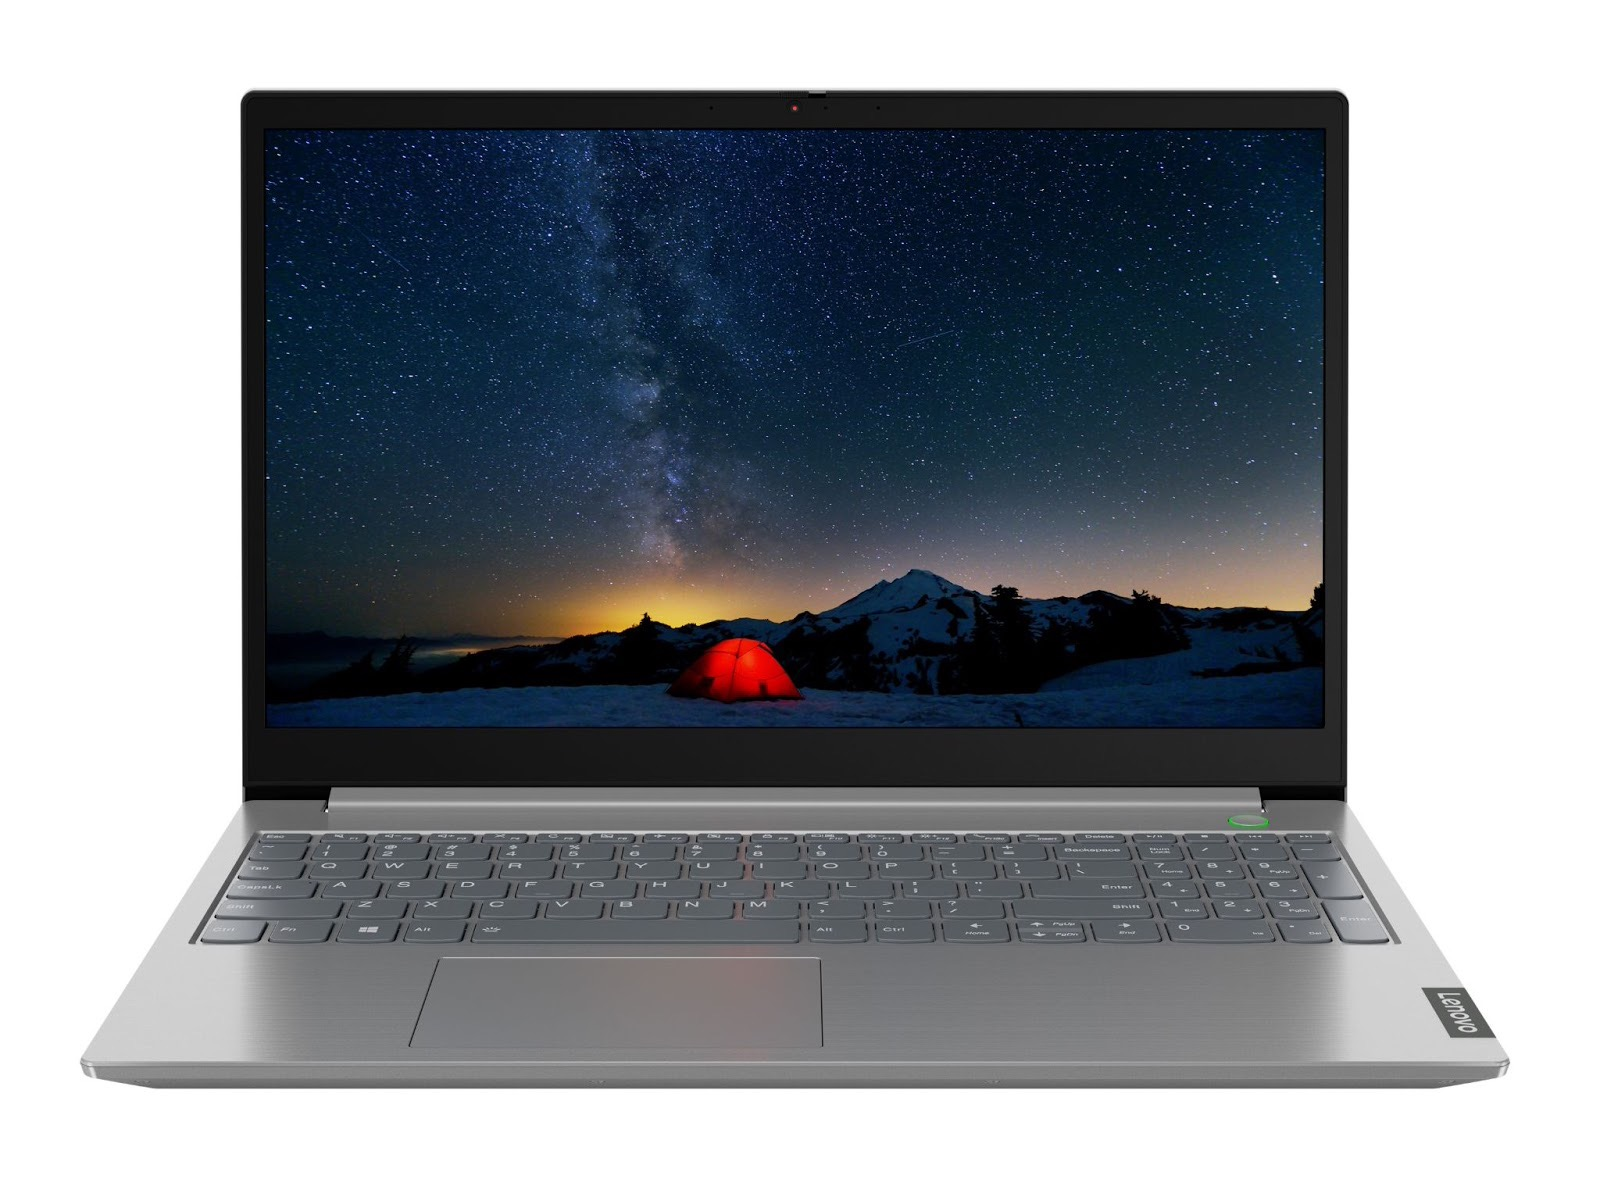 Фото 1. Ноутбук Lenovo ThinkBook 15 Gen 2 ARE (20VG00B0RU)